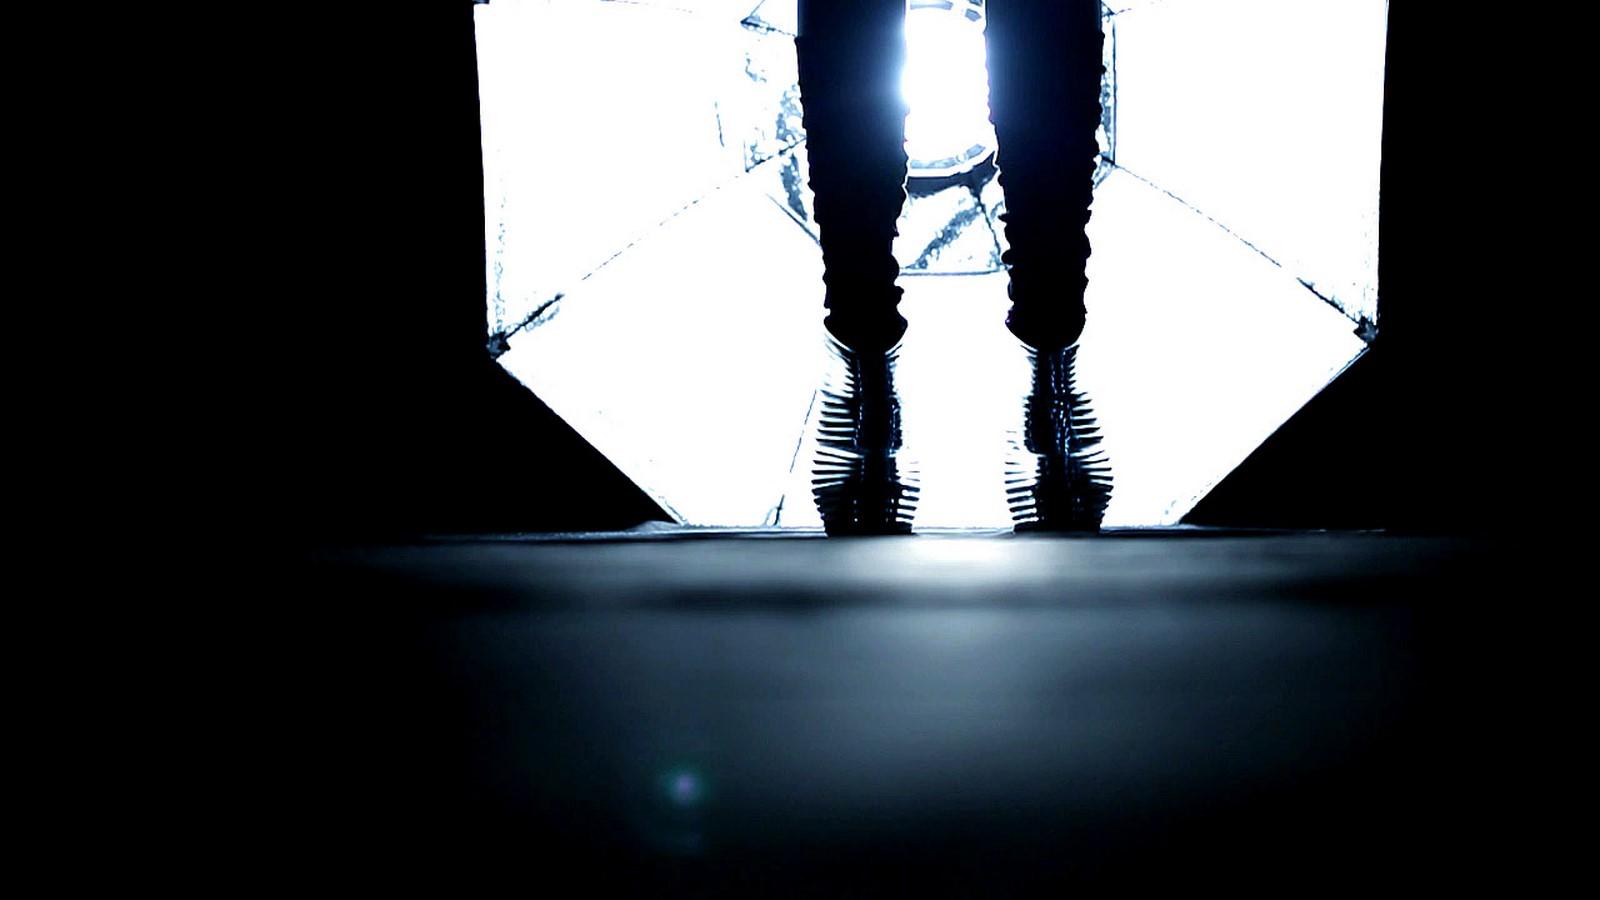 Shoes by Zaha Hadid - Sheet4